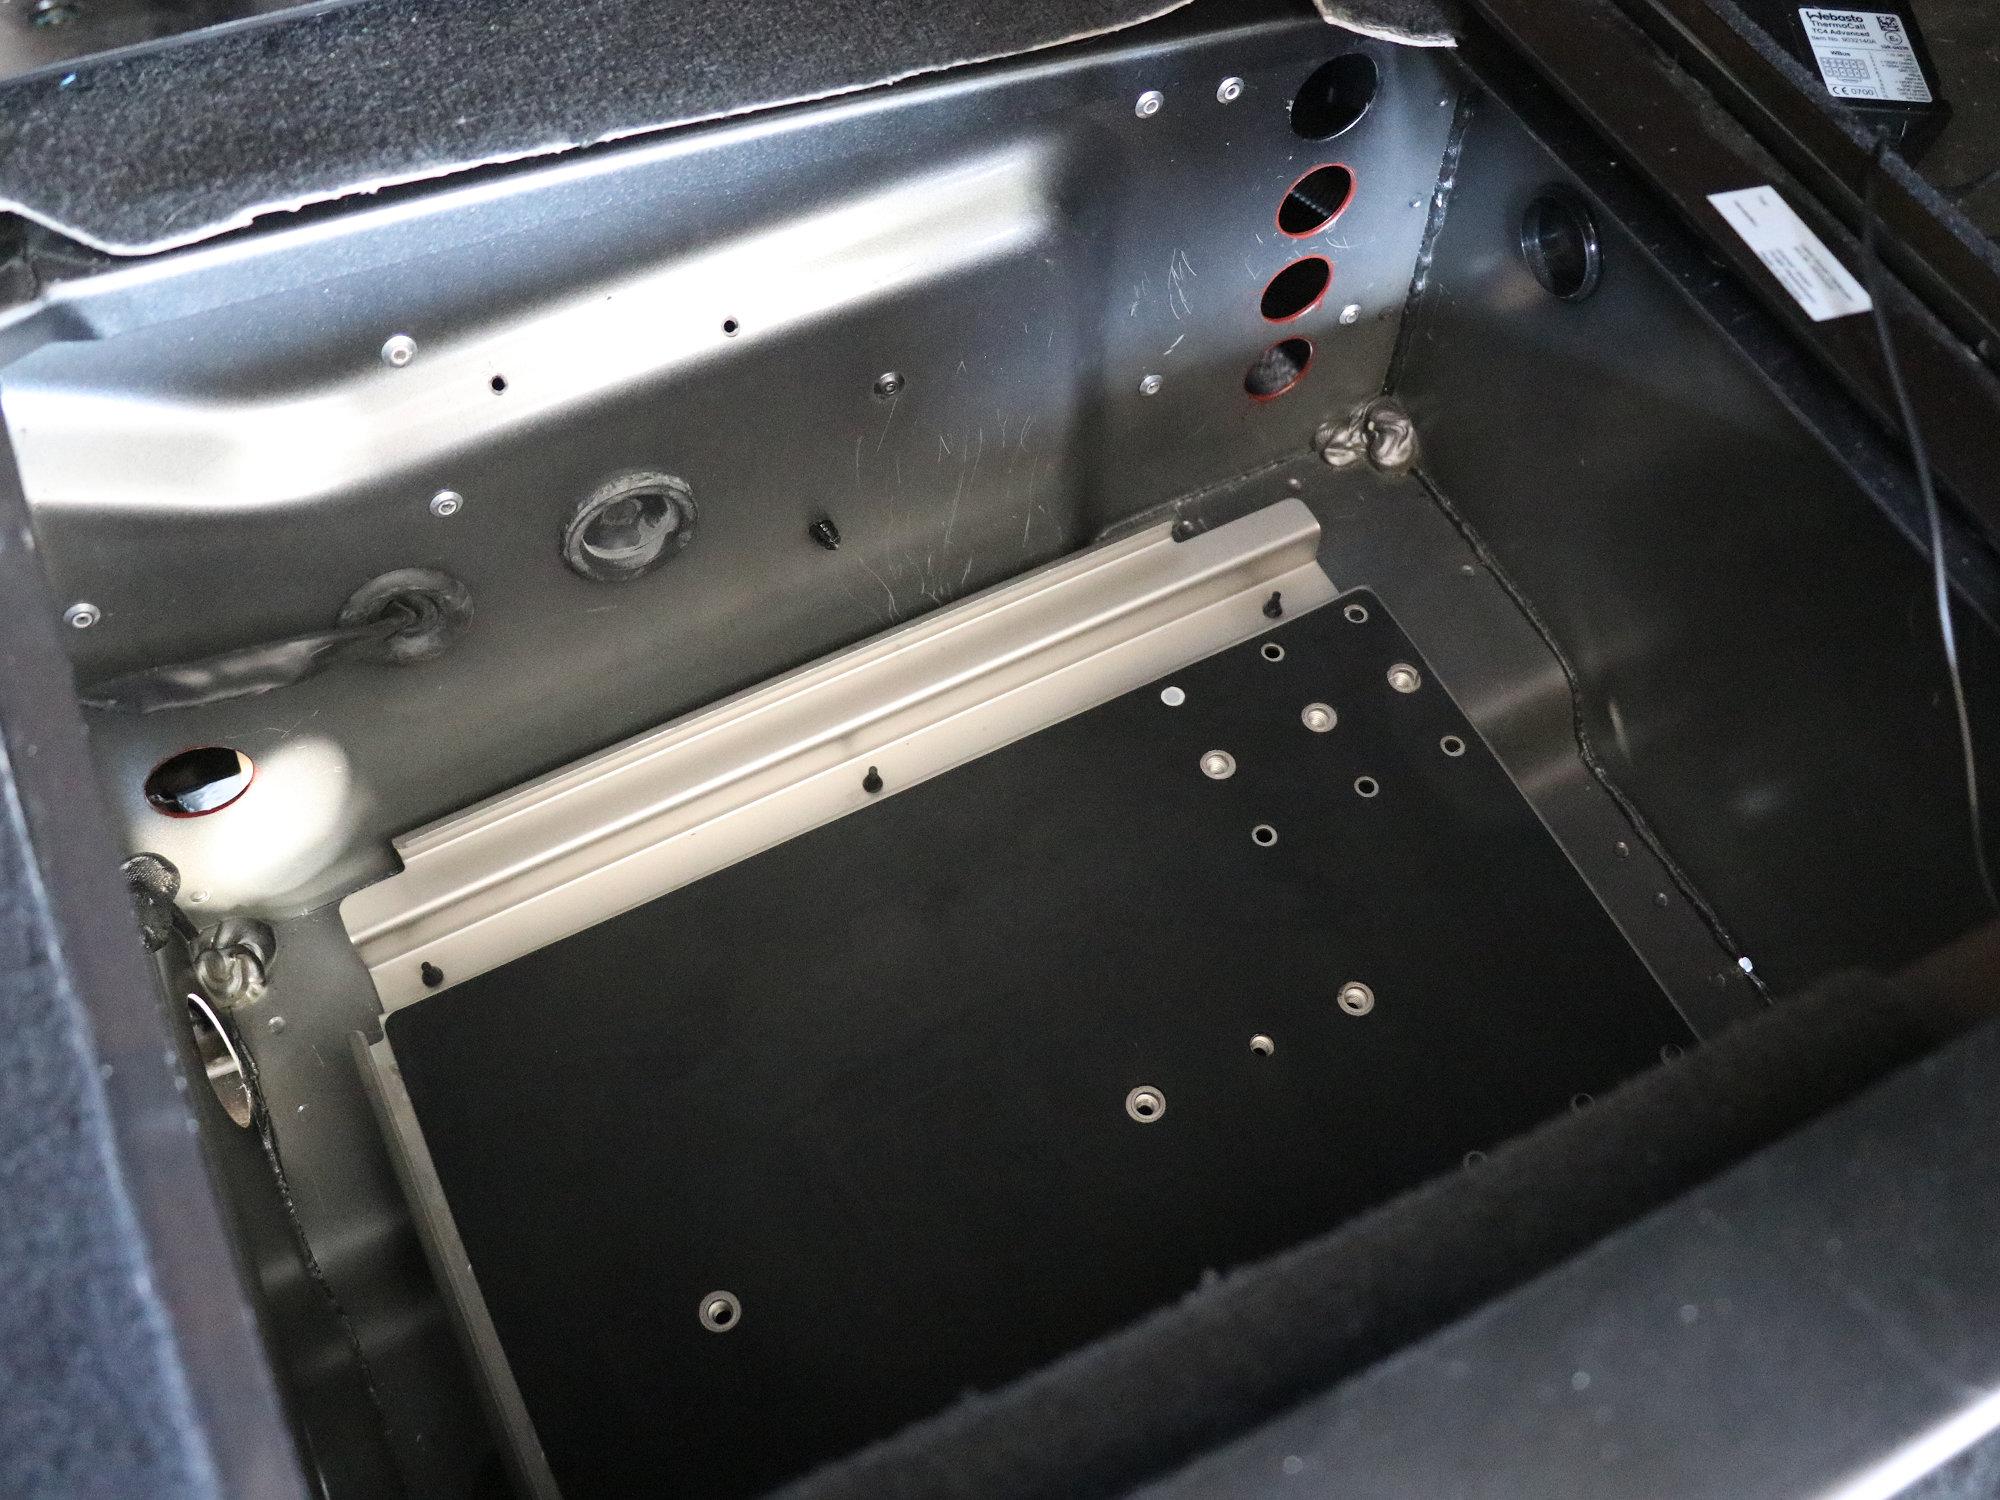 Neues Doppelbatteriesystem mit robustem Träger aus Edelstahl